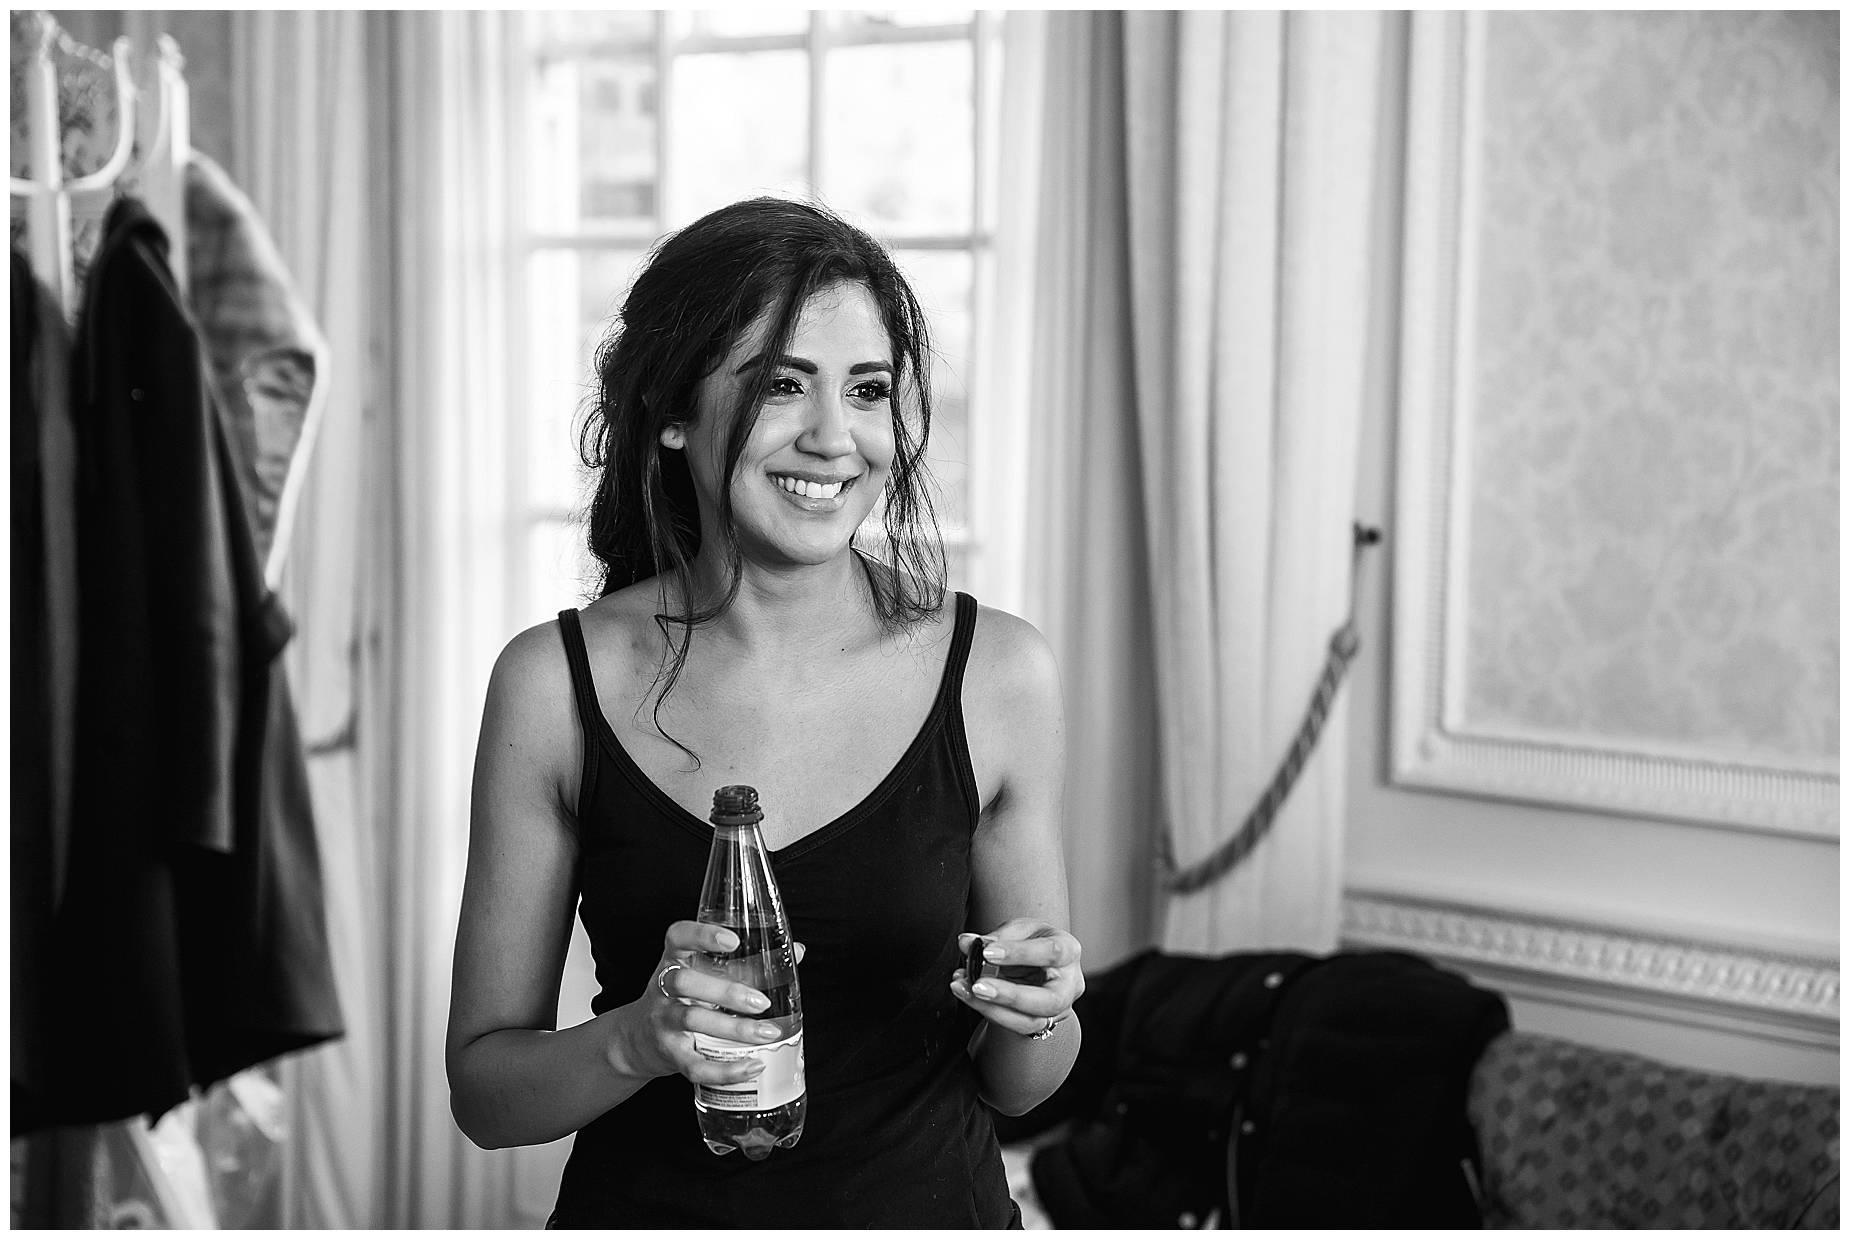 bridesmaid grabbed champagne